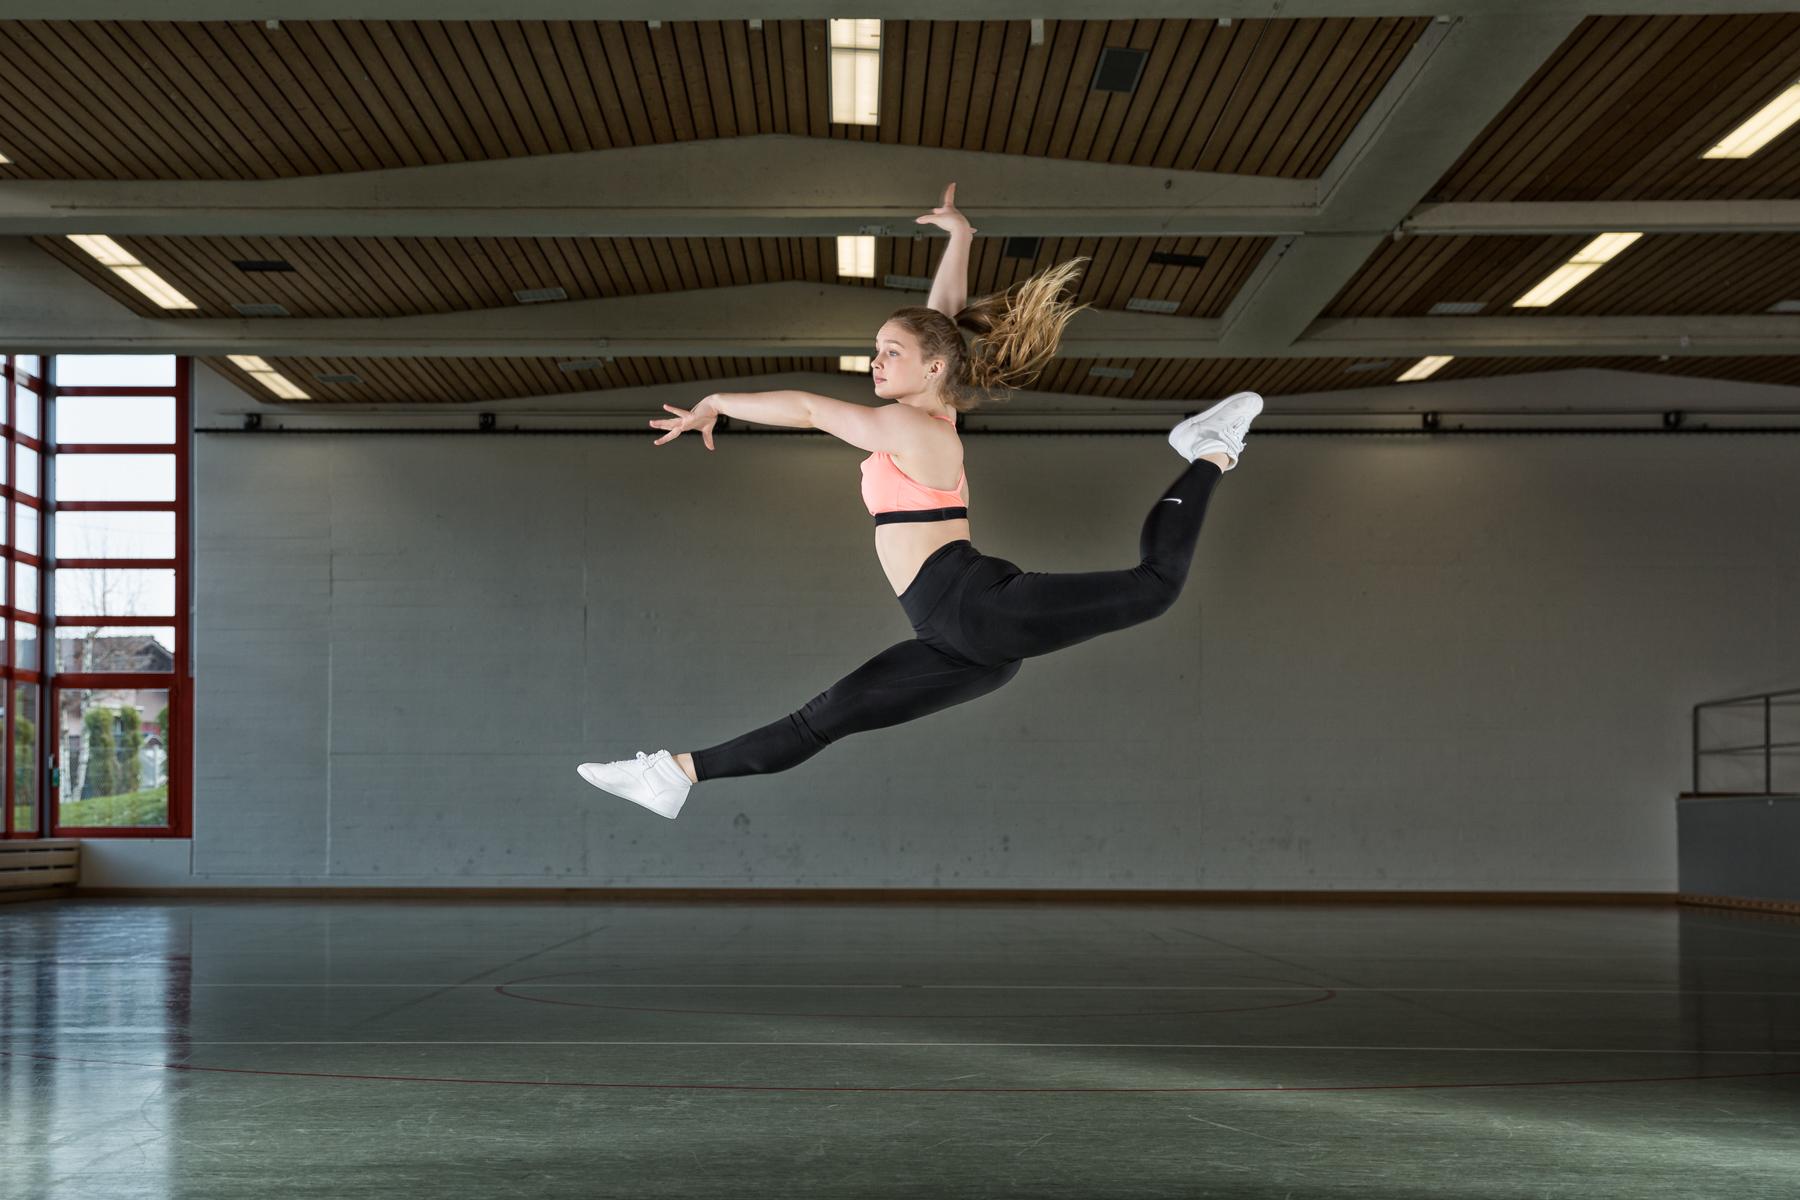 sport-aerobic-fotografie-schweiz